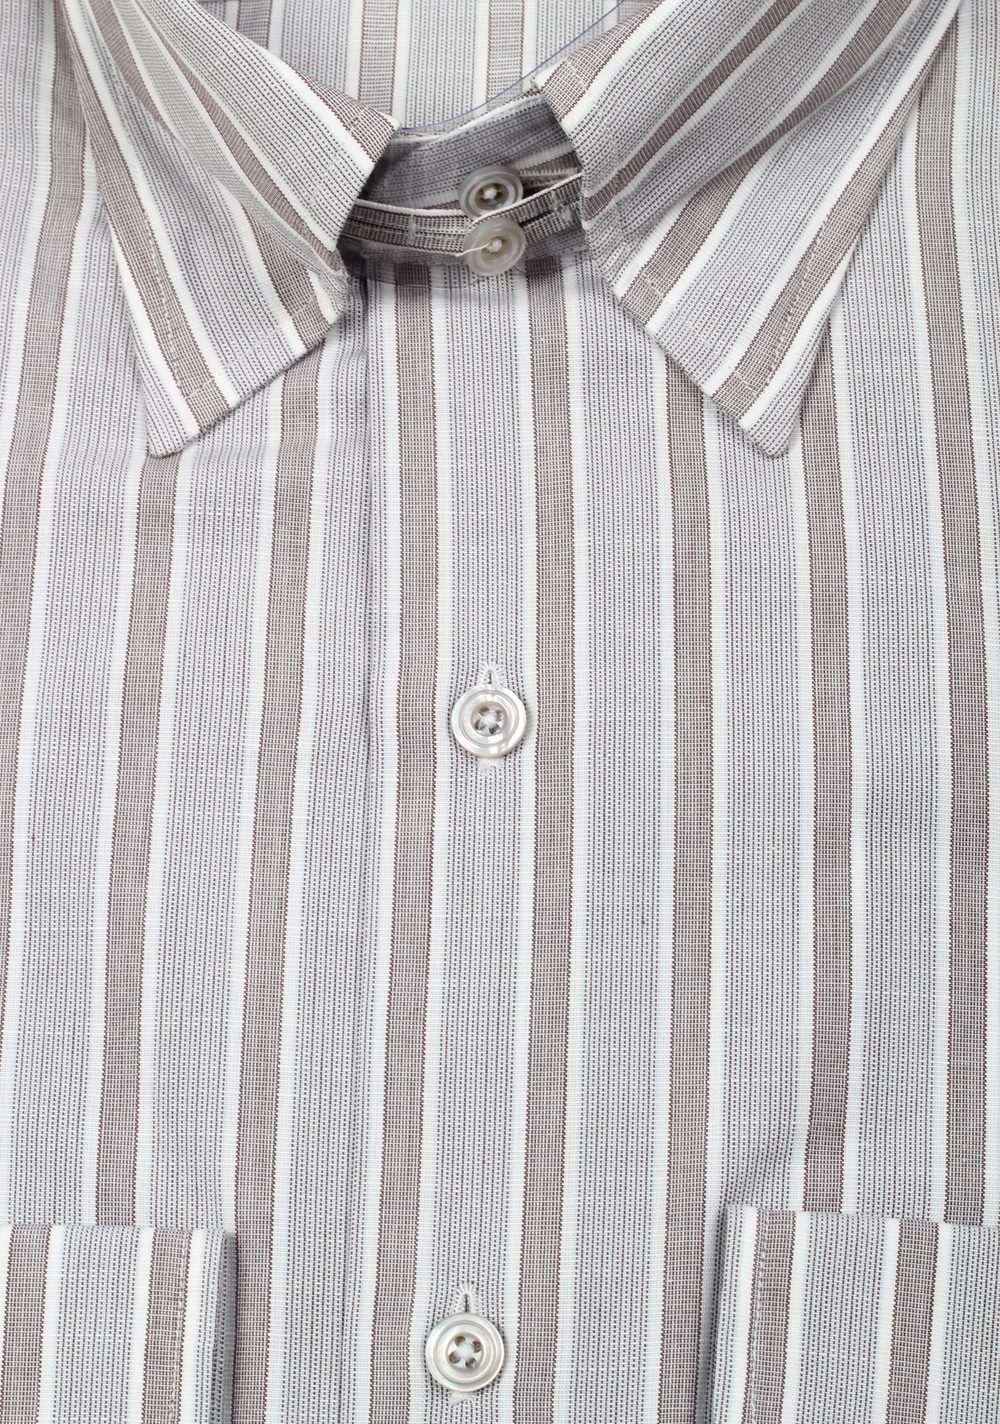 TOM FORD Striped Gray High Collar Dress Shirt Size 40 / 15,75 U.S. | Costume Limité